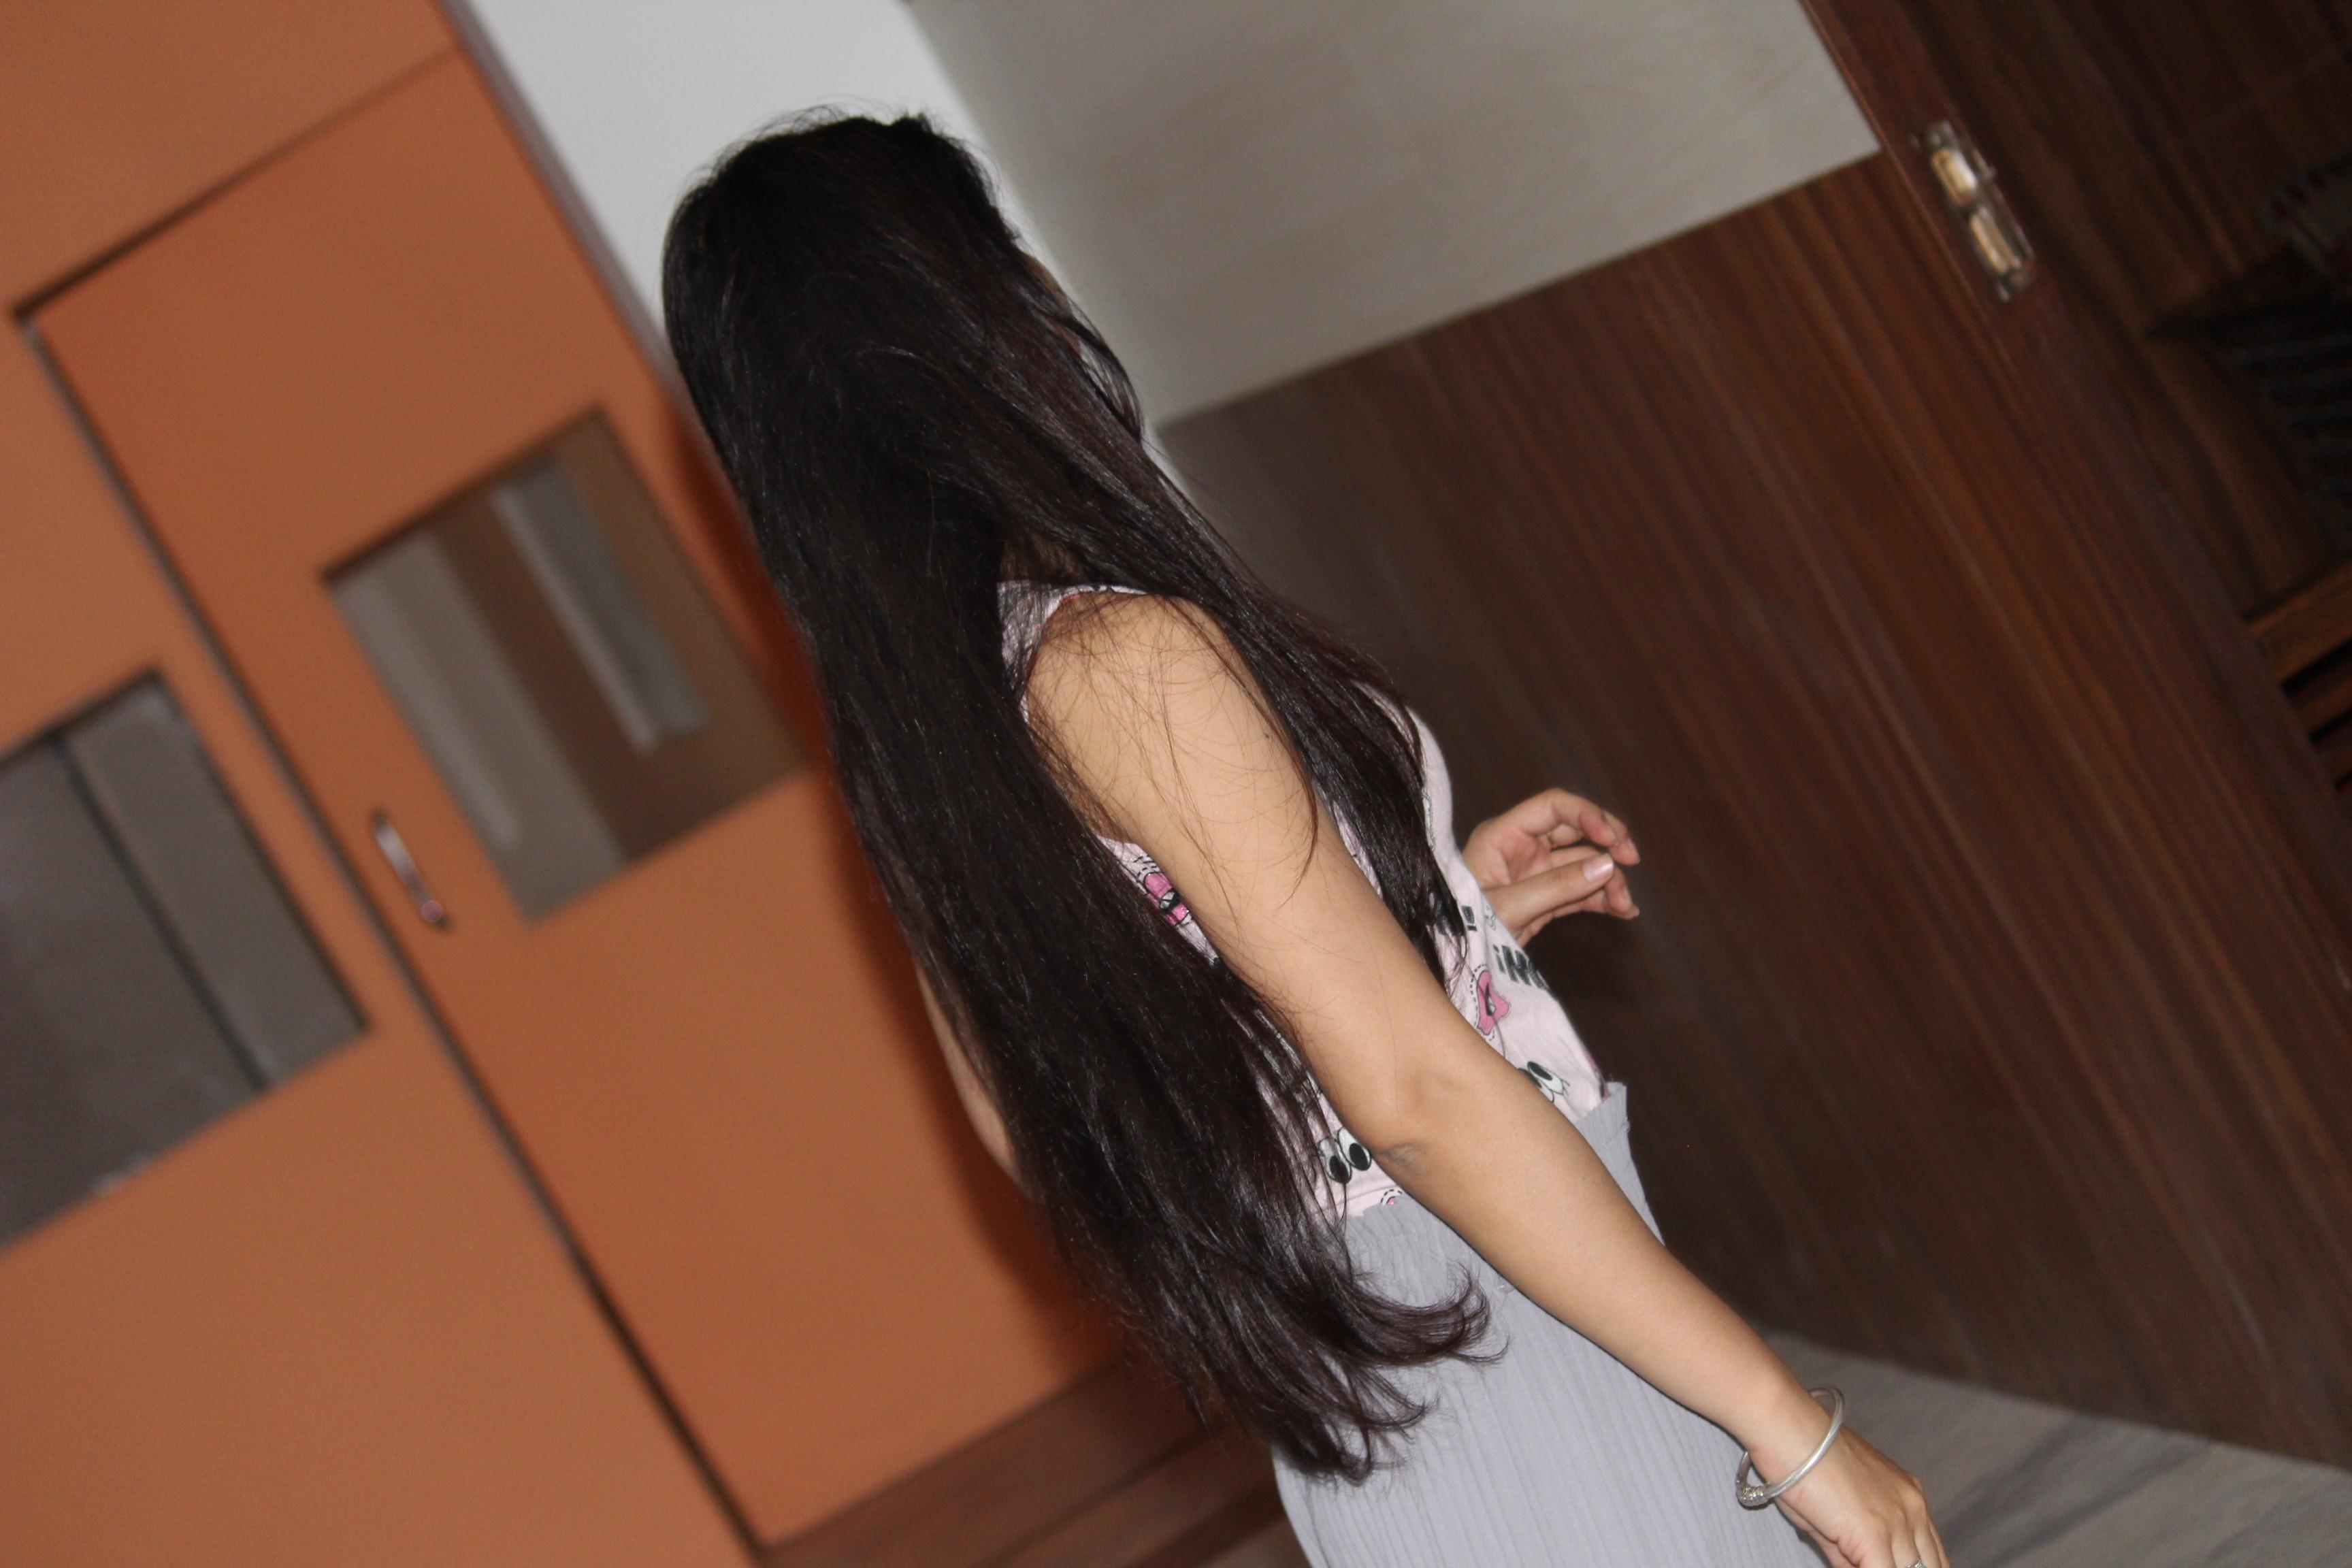 Head & Shoulders Smooth And Silky Shampoo-Perfumed hair-By kamaldeep_kamboj